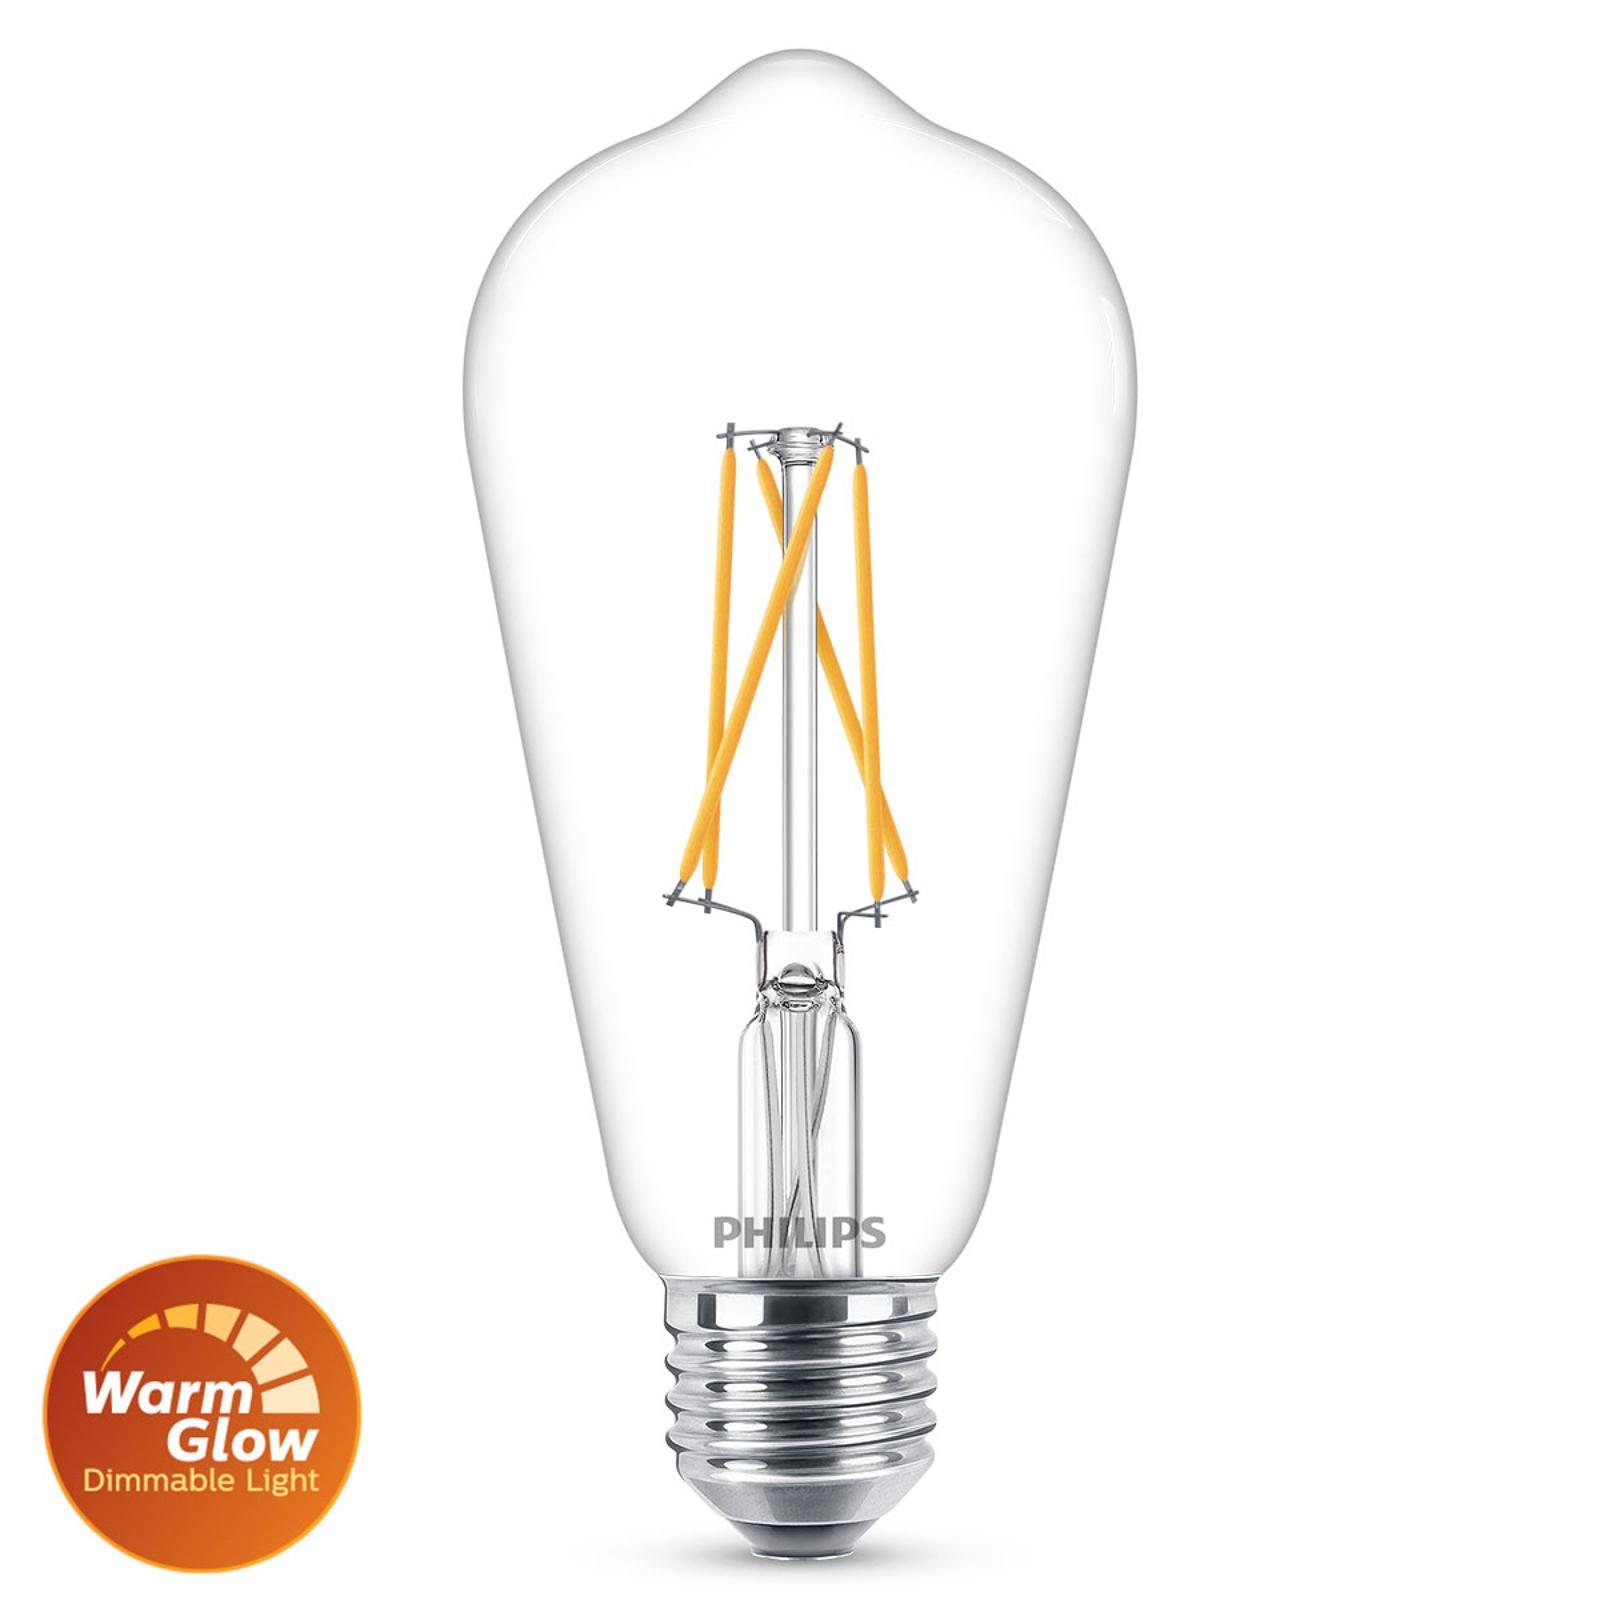 Philips Warmglow E27 LED-pære Rustika 6 W klar